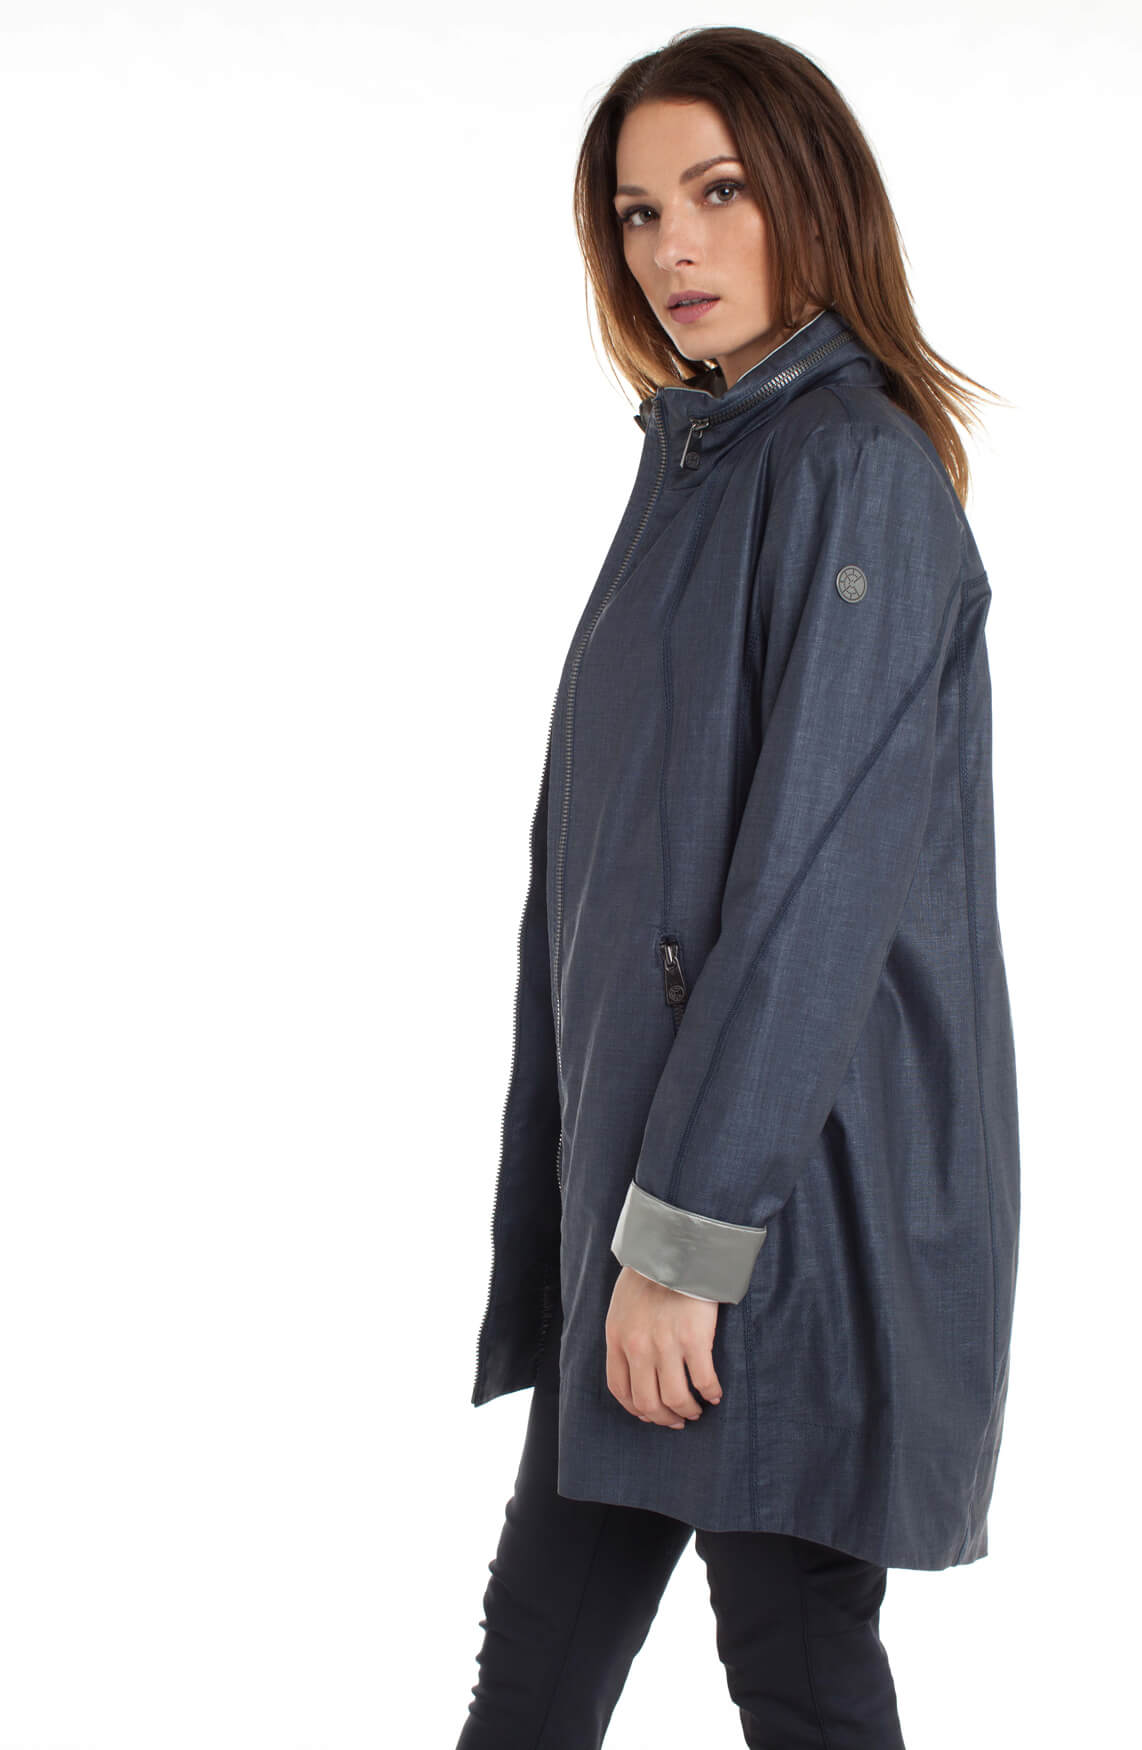 Creenstone Dames Jas met contrasterende stof Blauw | Anna